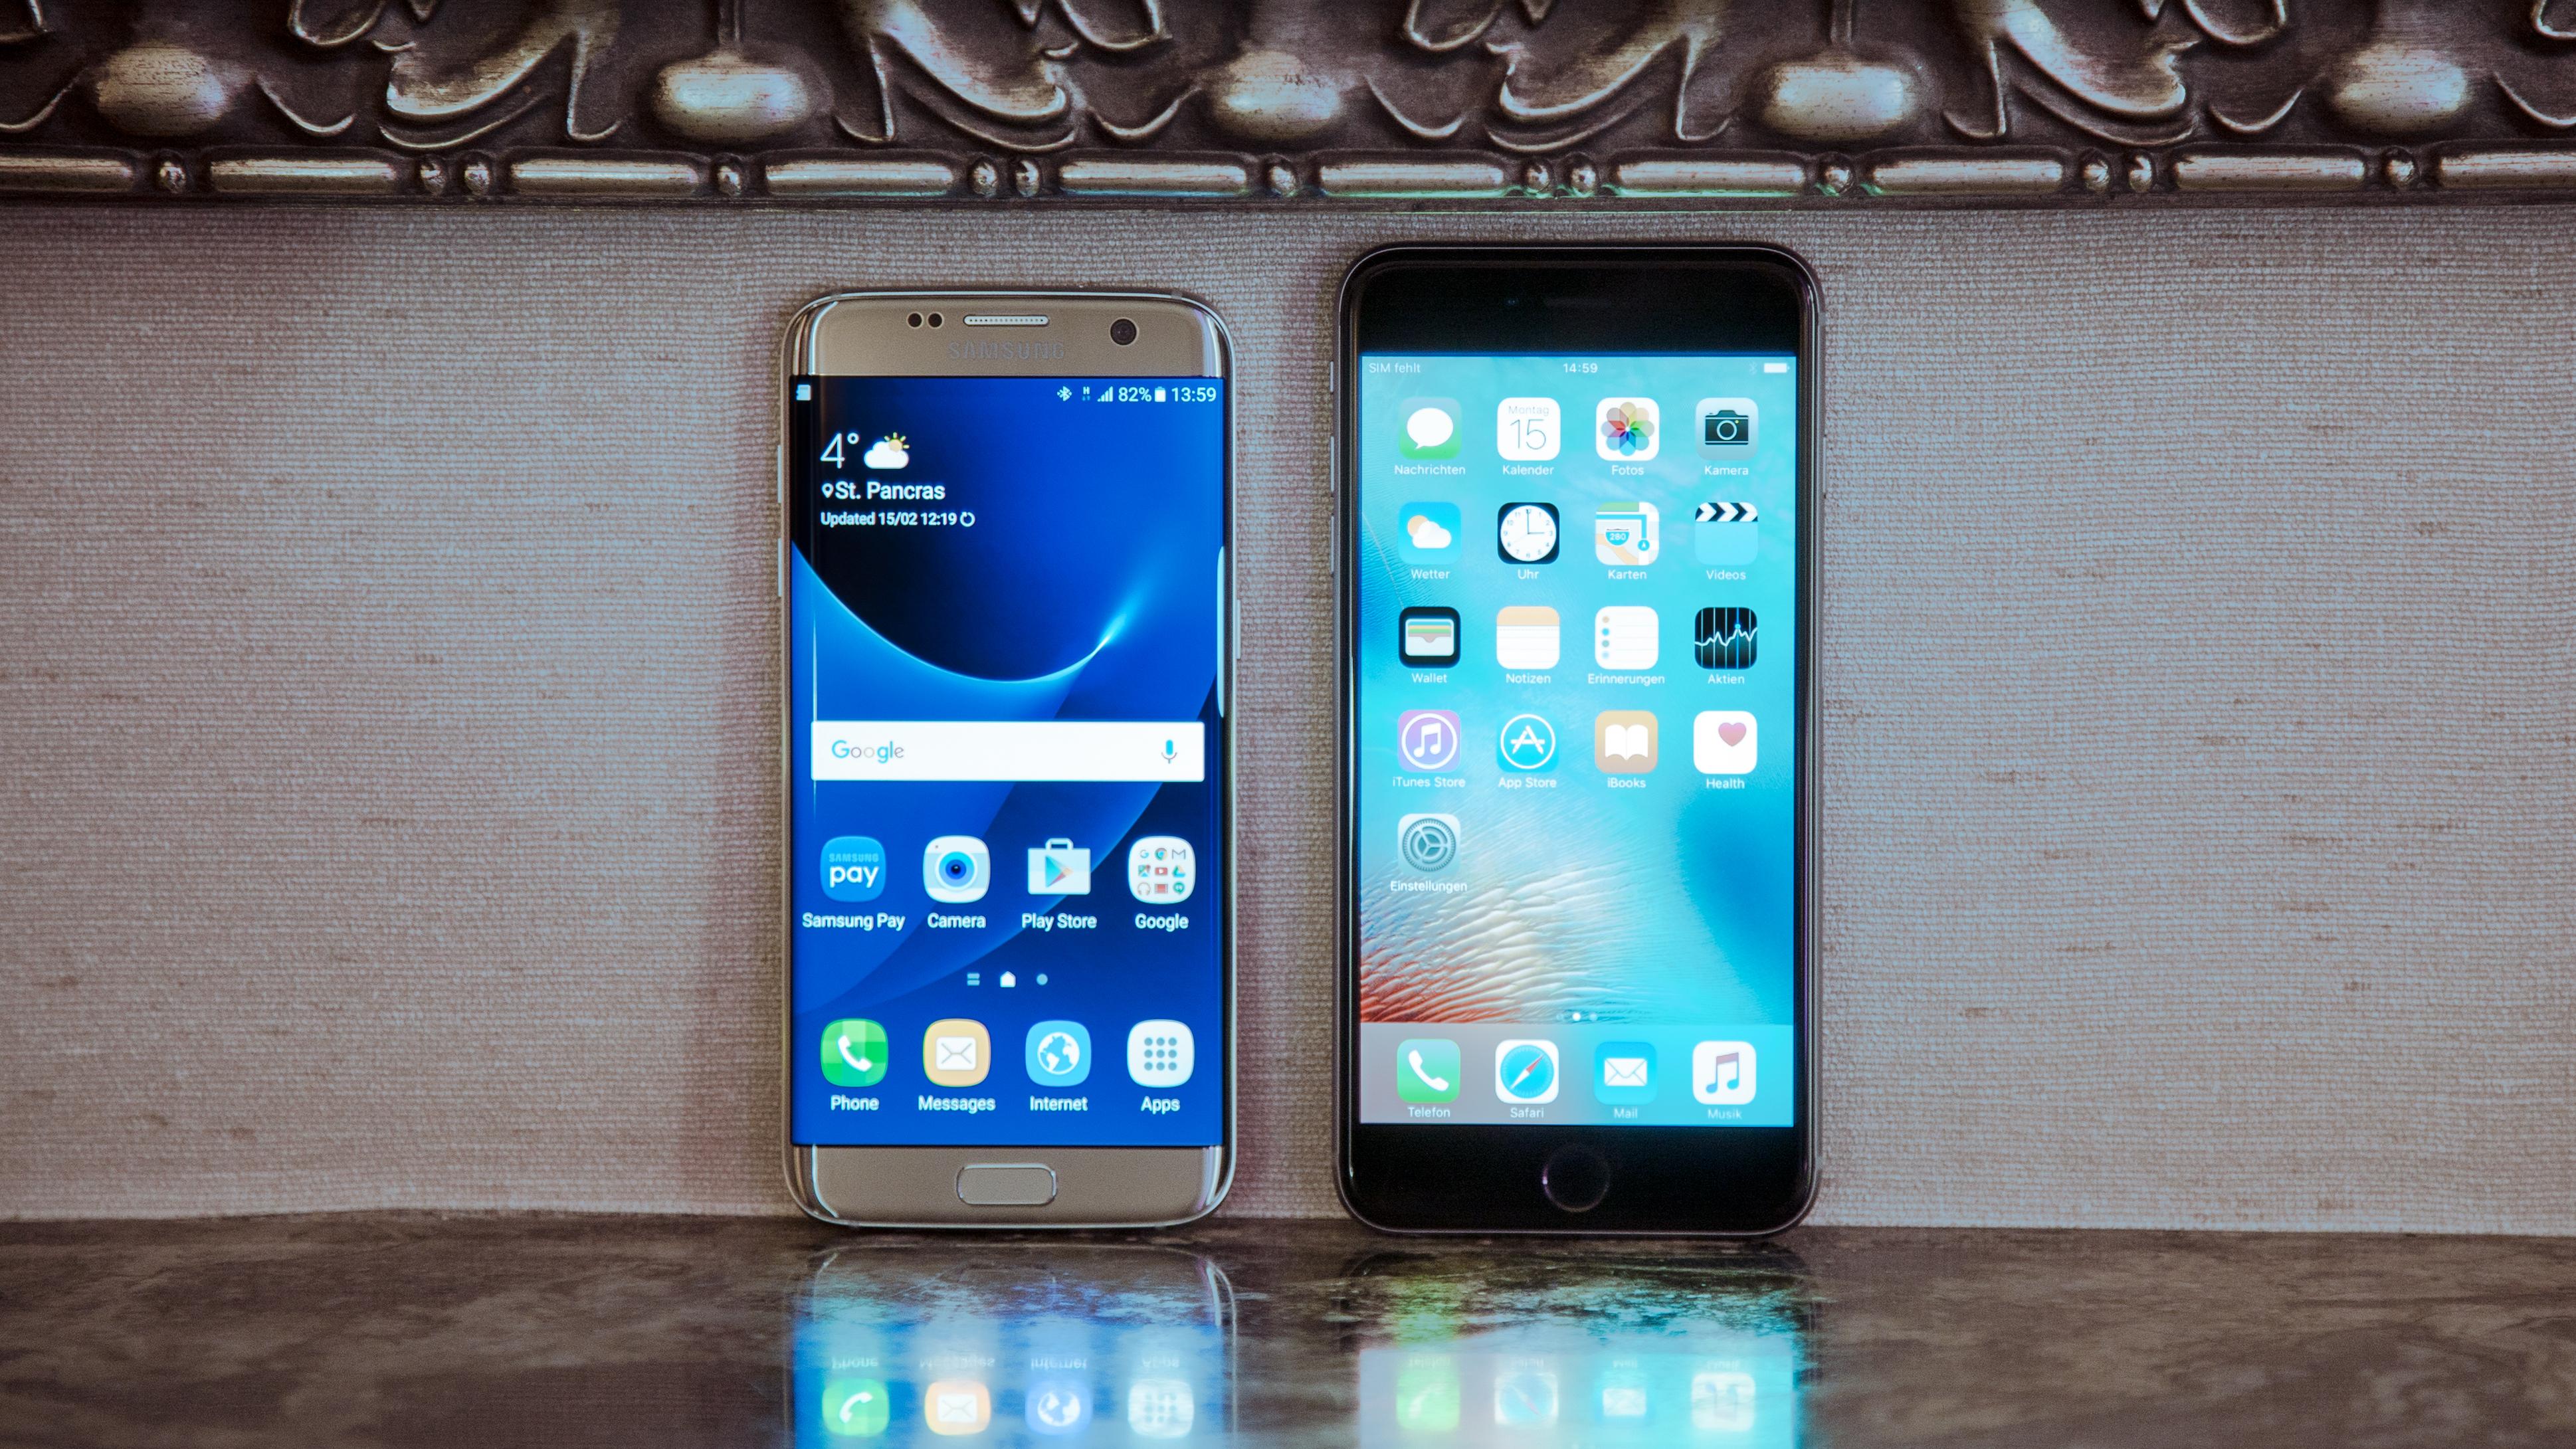 Samsung Galaxy S7 edge Samsung Galaxy S7 edge links